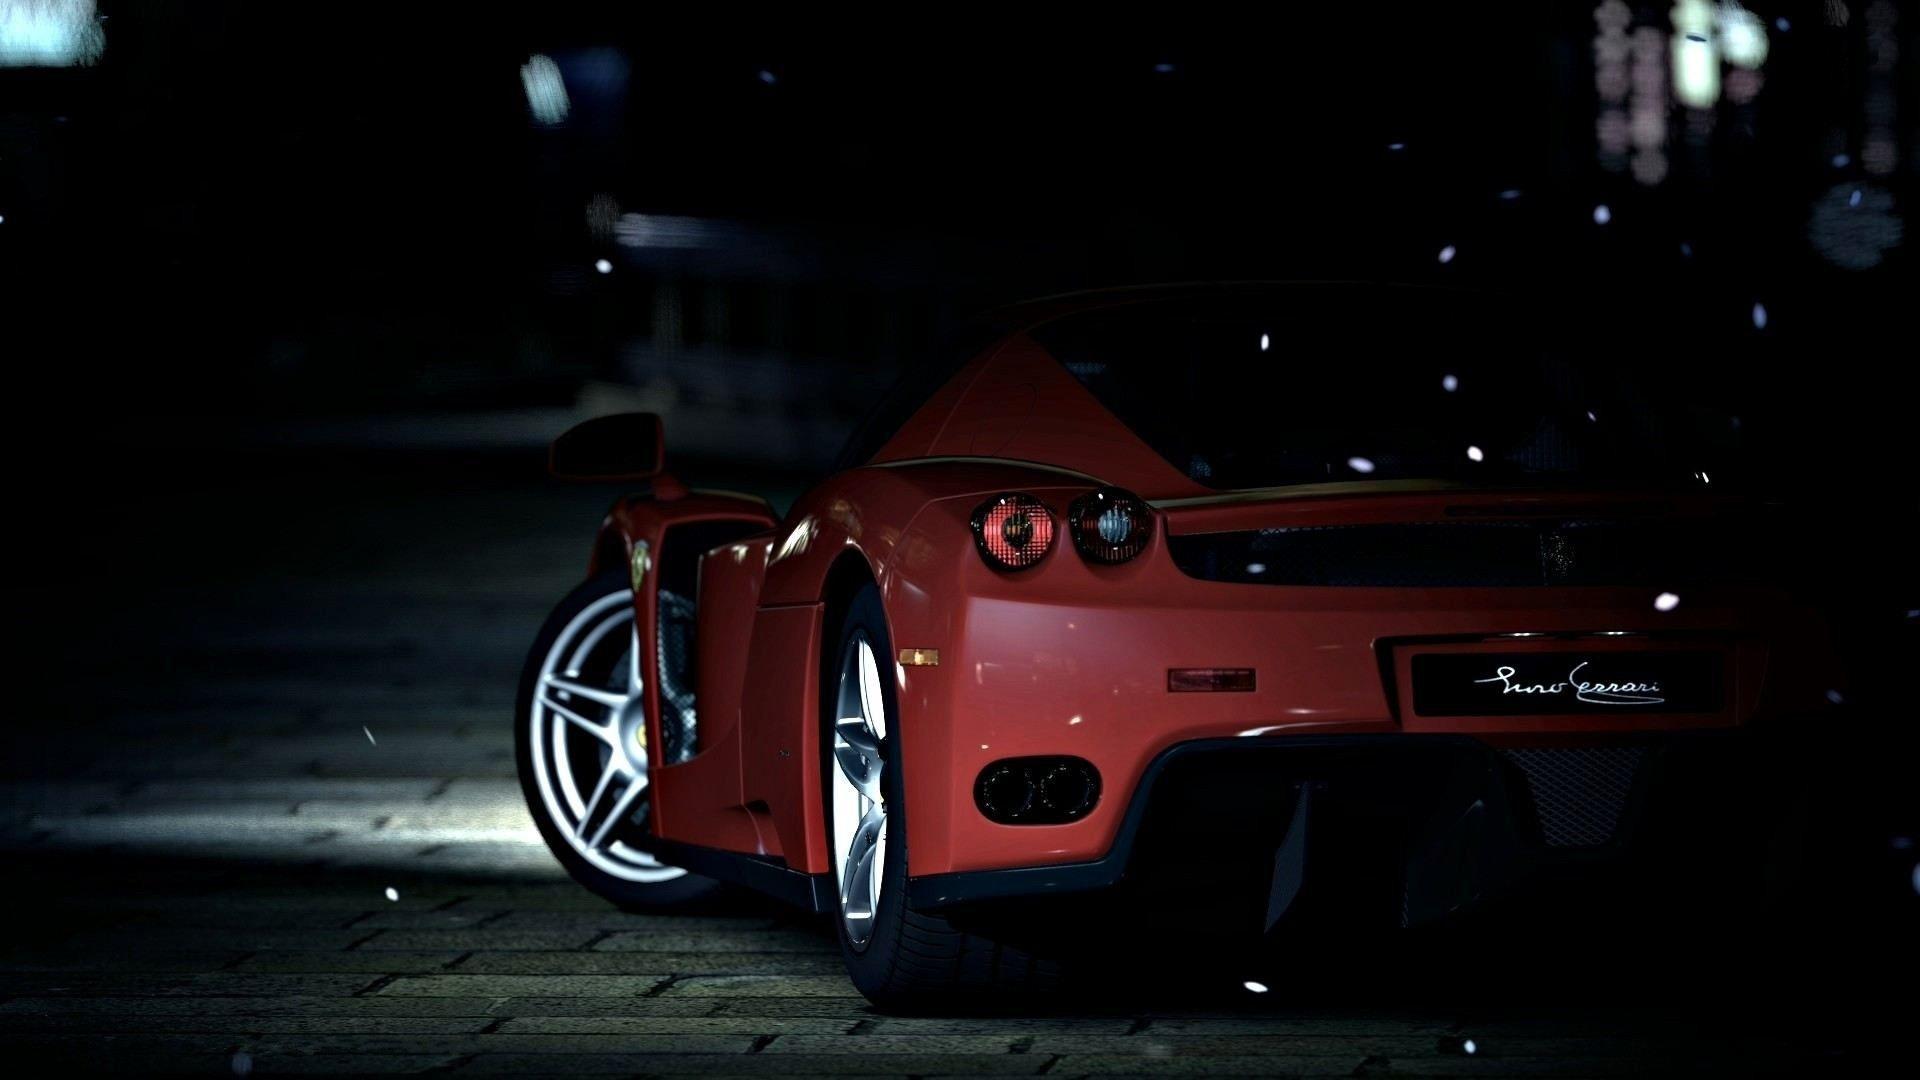 Dark Ferrari Wallpapers Top Free Dark Ferrari Backgrounds Wallpaperaccess